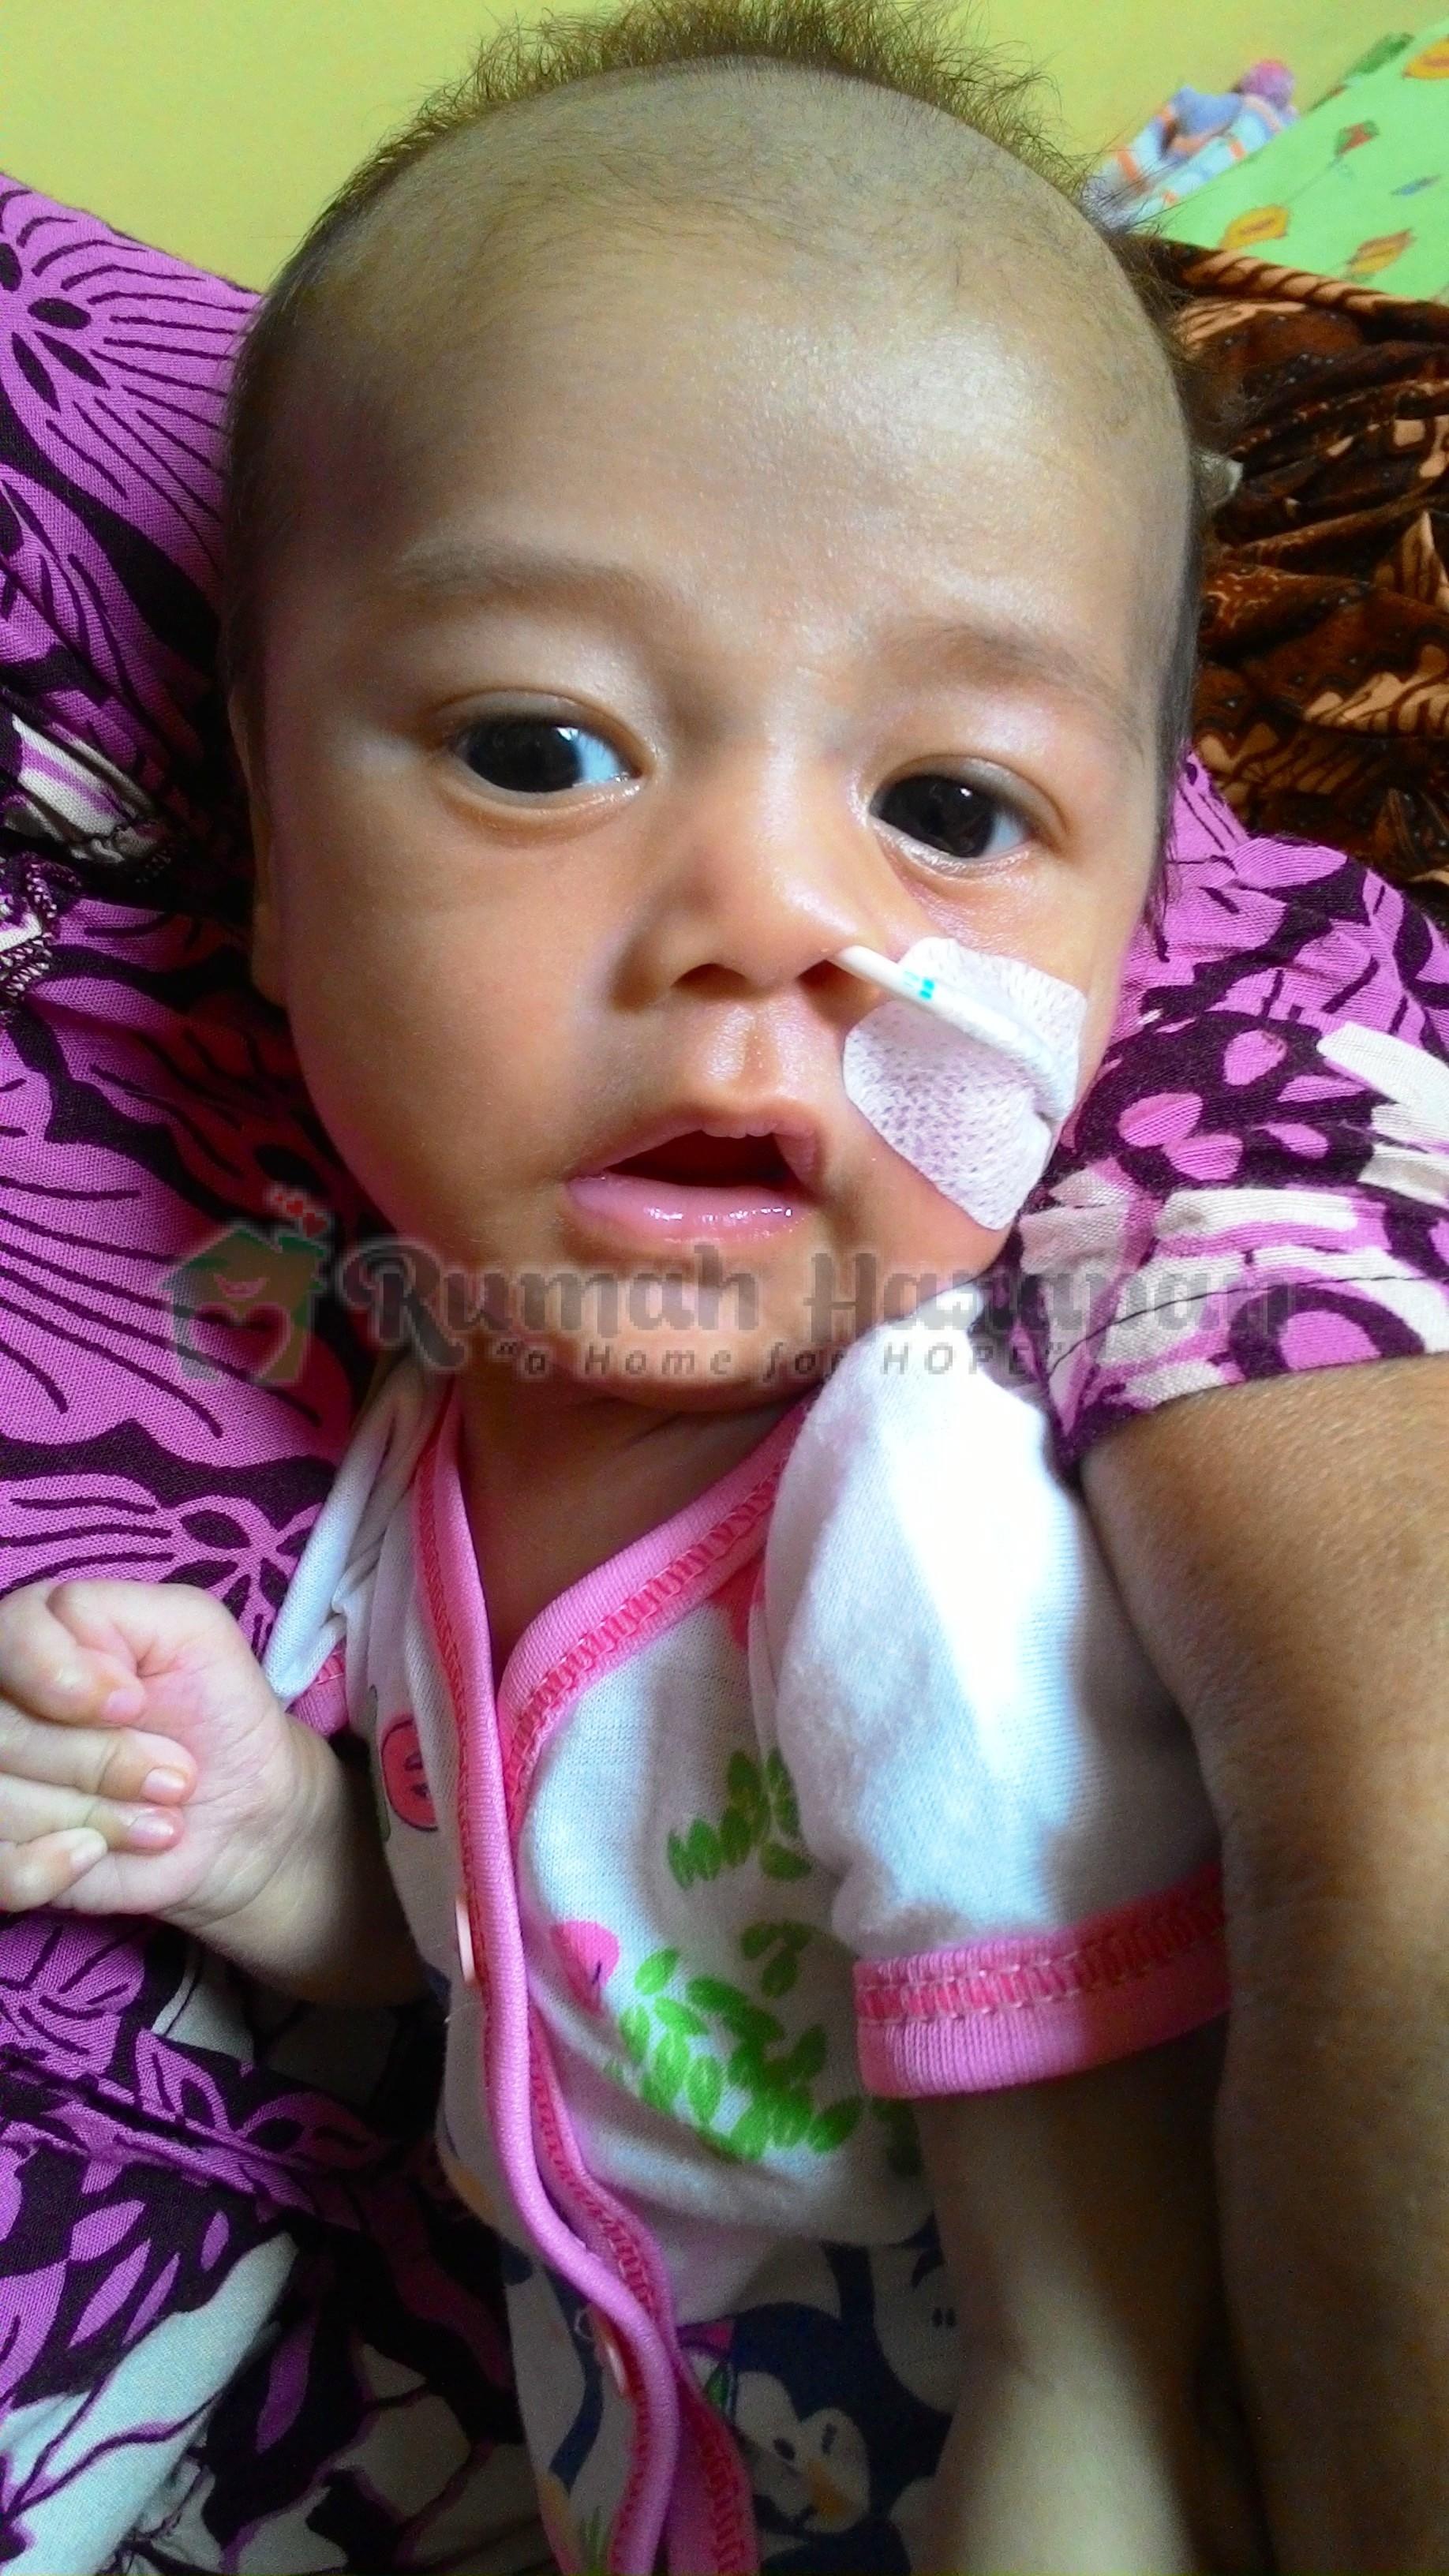 Rizki: Bayi Mungil yang Berjuang